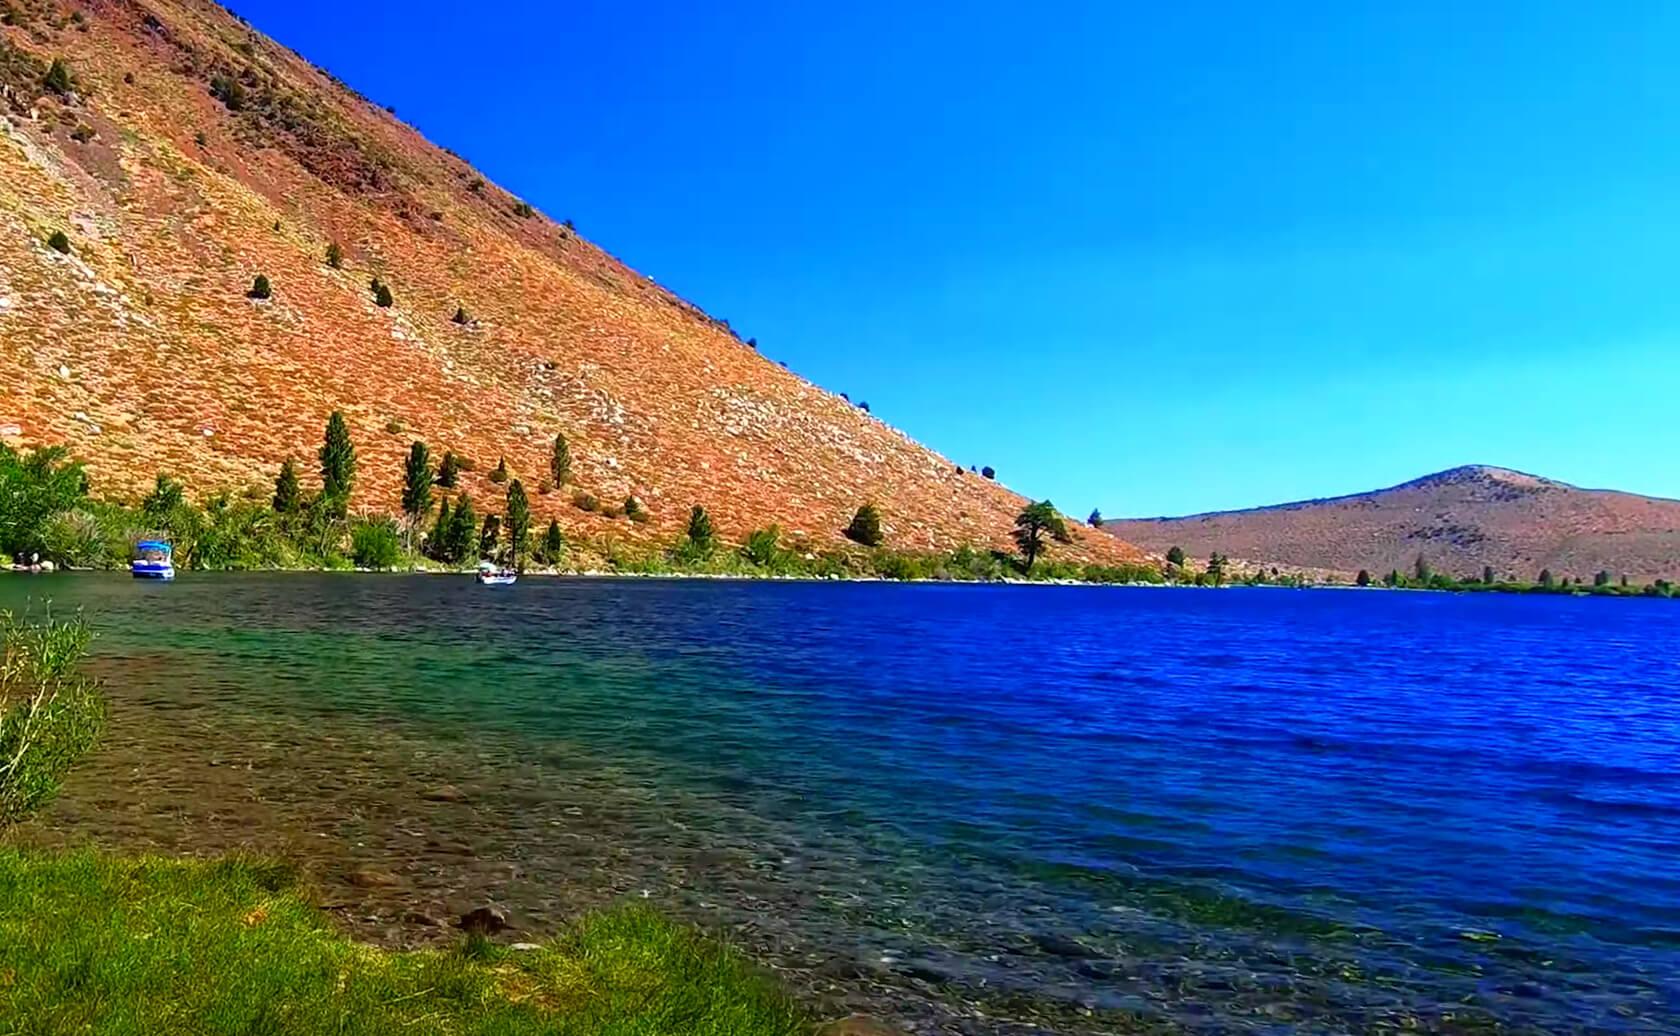 Convict-Lake-Reservoir-Fishing-Guide-Report-California-06